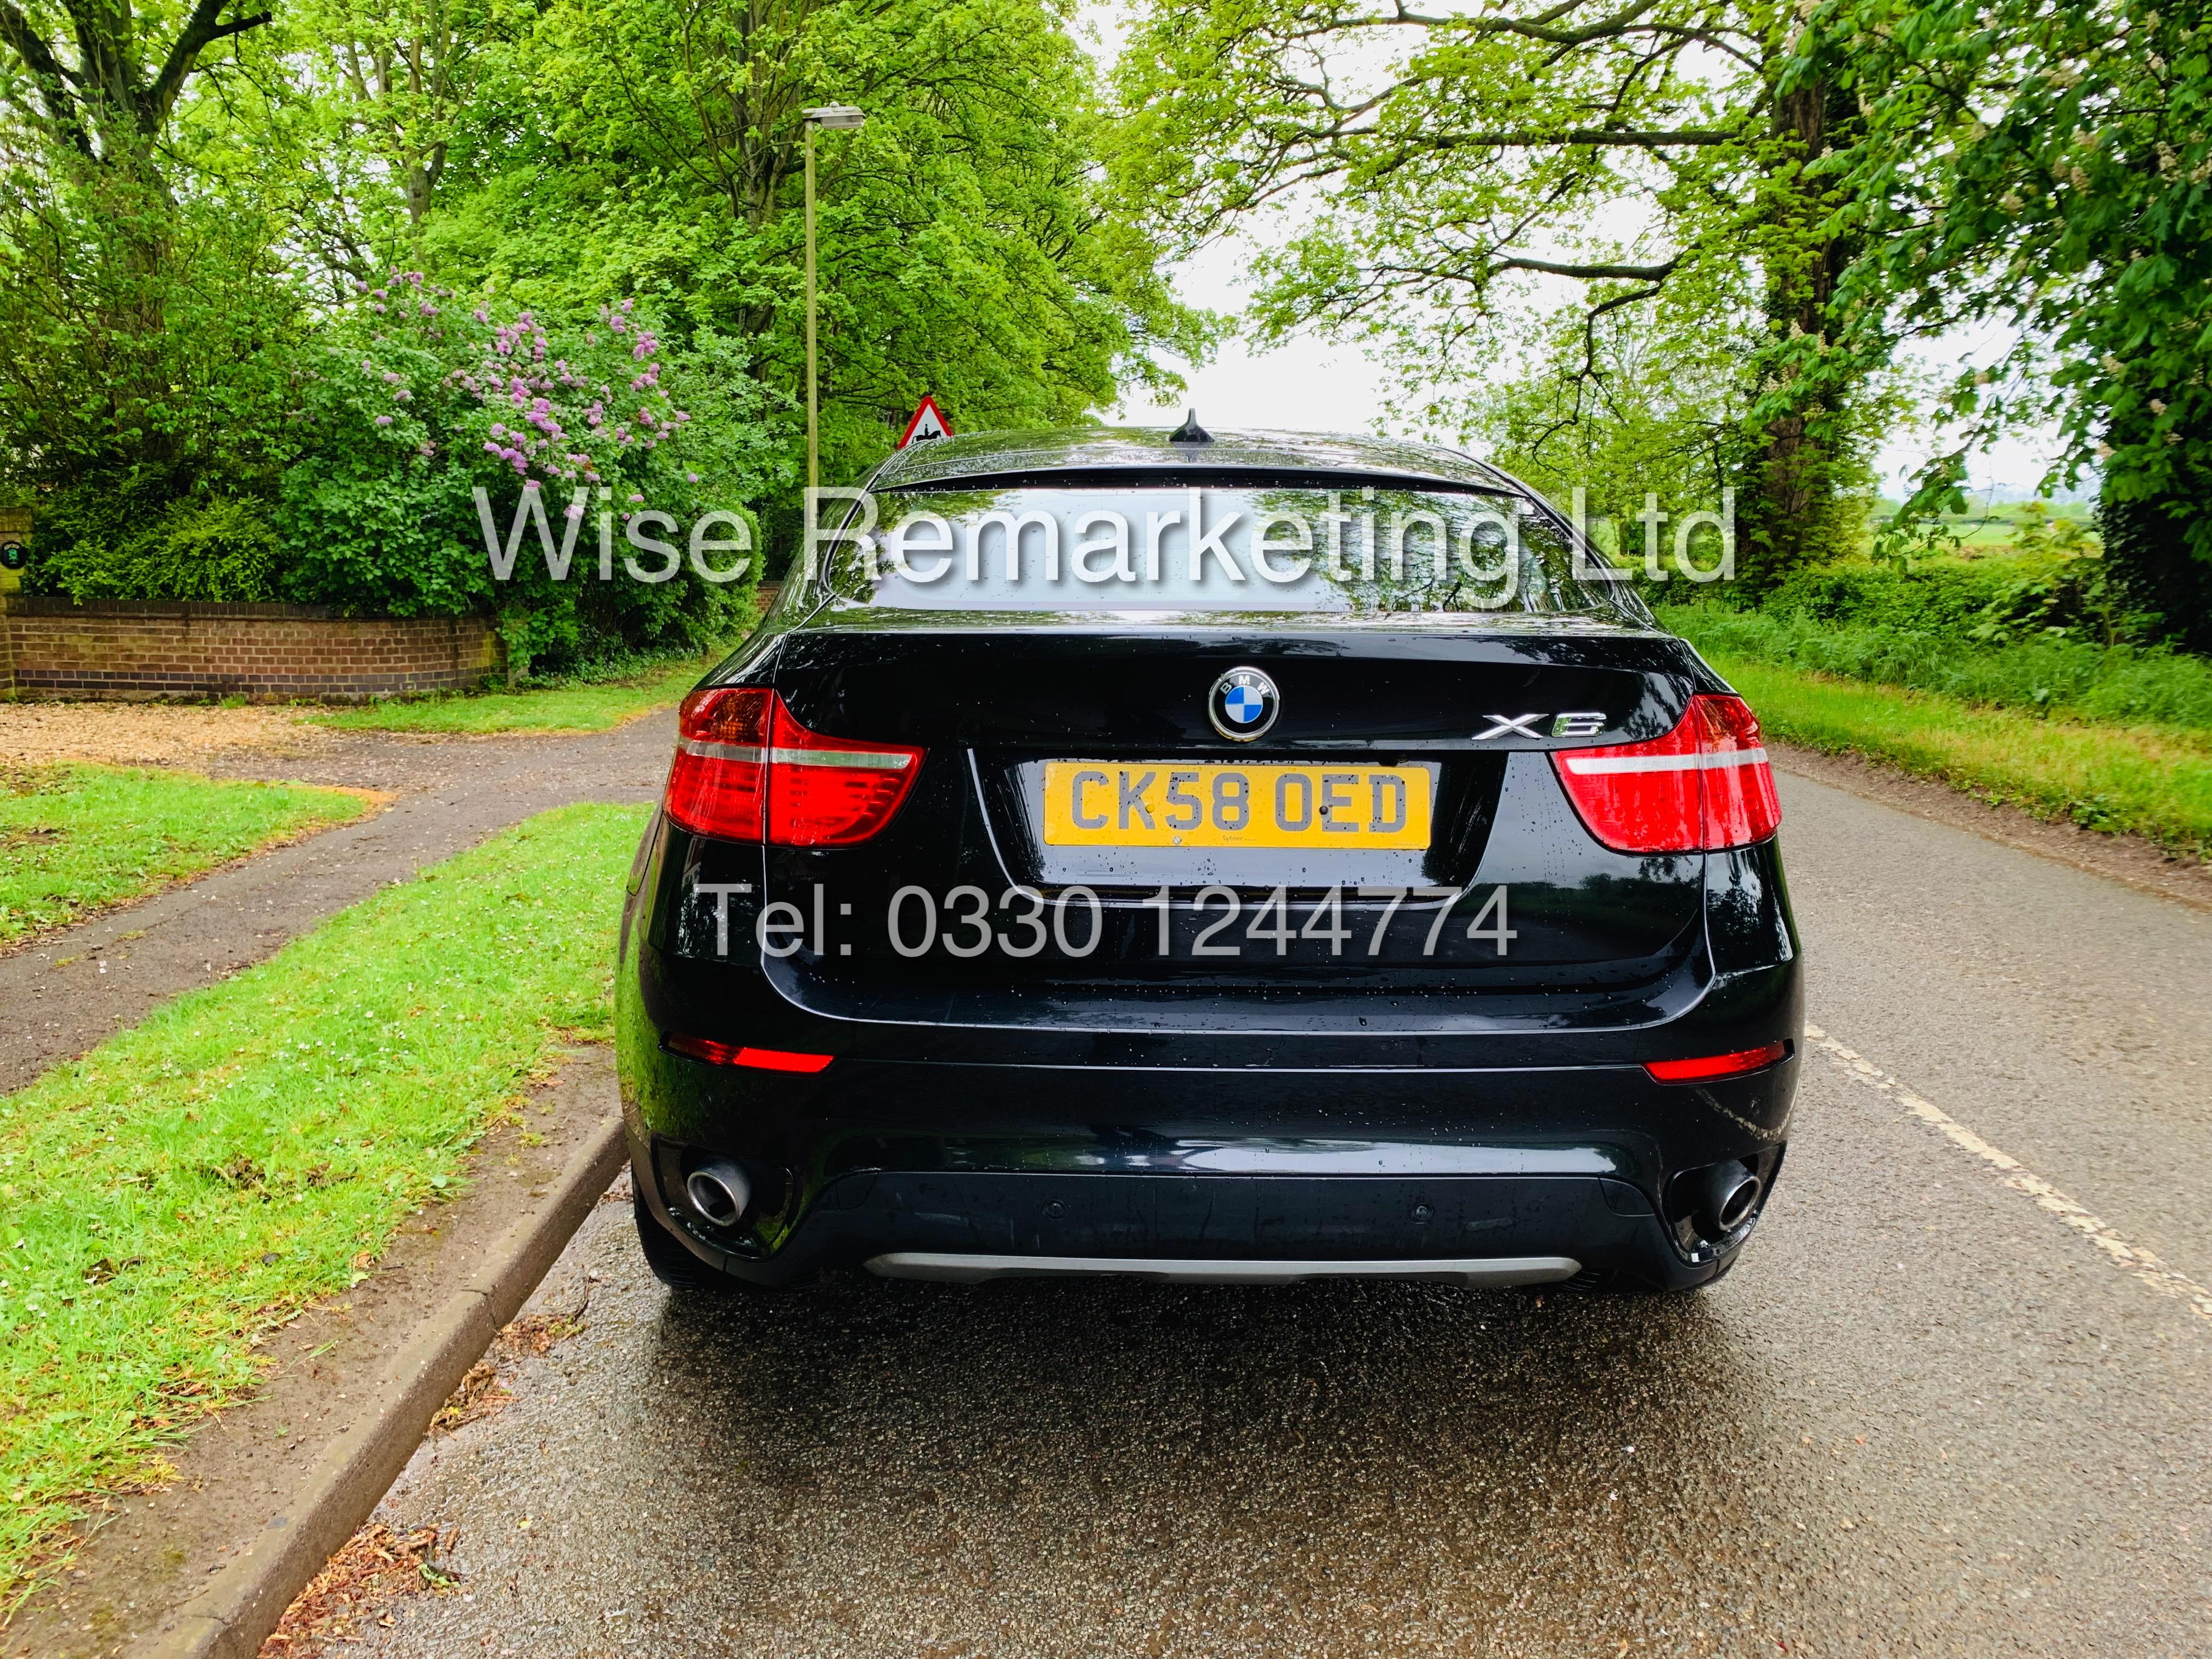 BMW X6 XDRIVE 35D AUTO (2009 SPEC) *1 PREVIOUS OWNER* PARKING AID - SAT NAV - FSH - Image 3 of 25